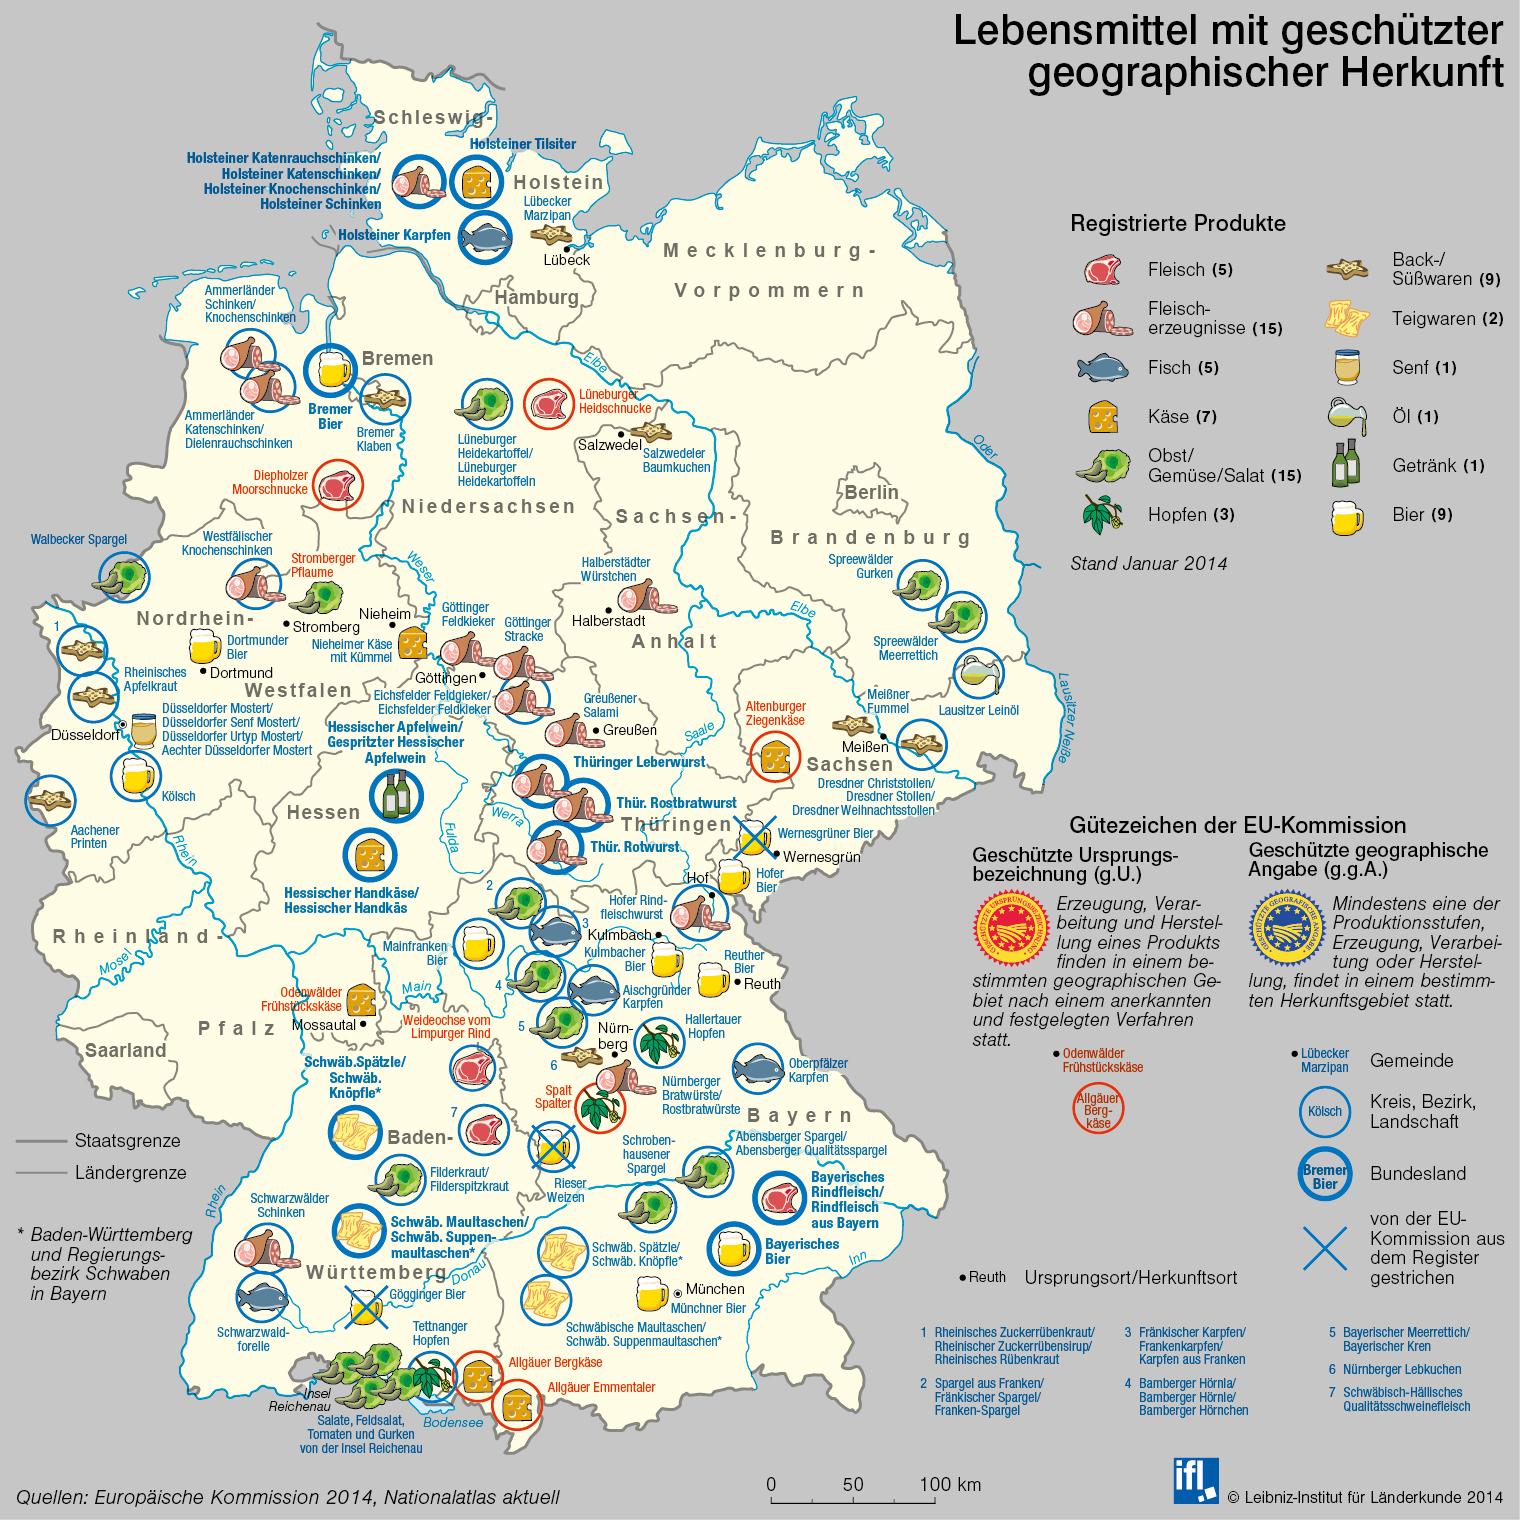 Coupons deutschland lebensmittel 2019